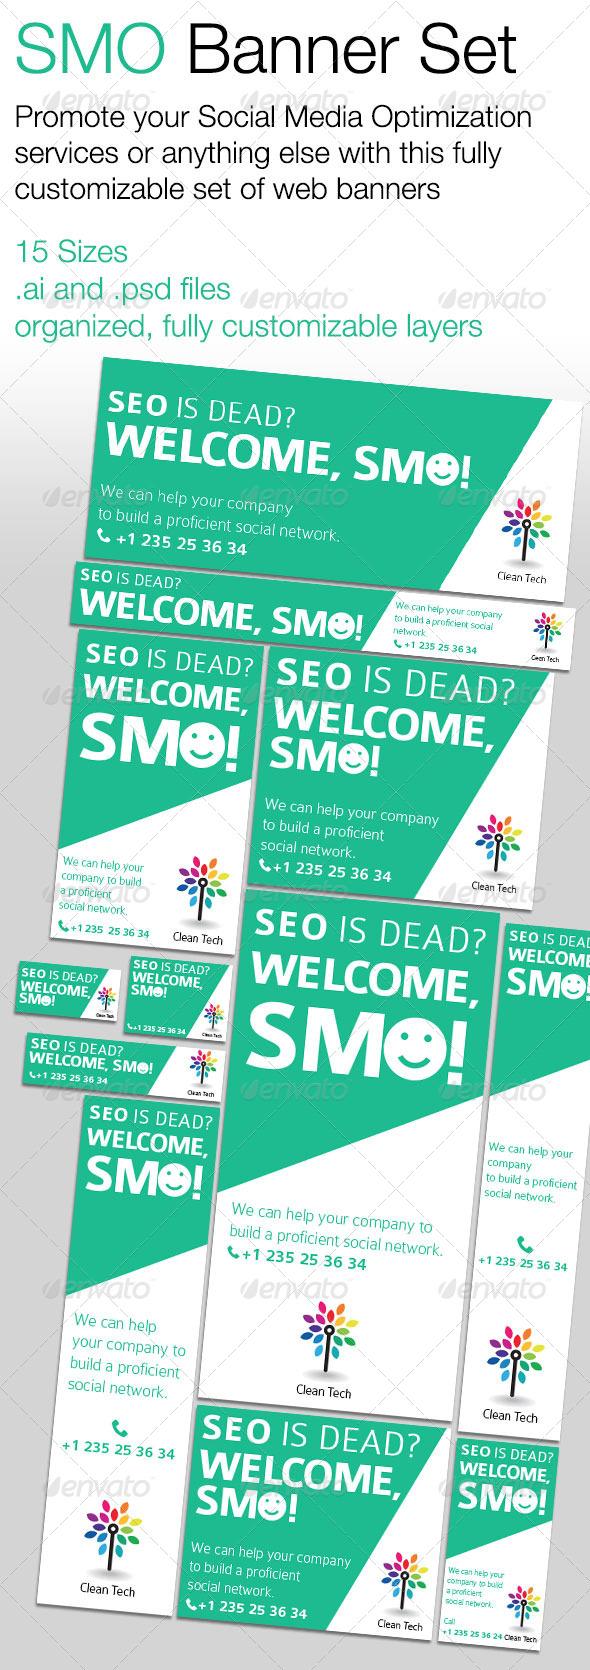 GraphicRiver SMO Social Media Optimization Banner Set 5434081